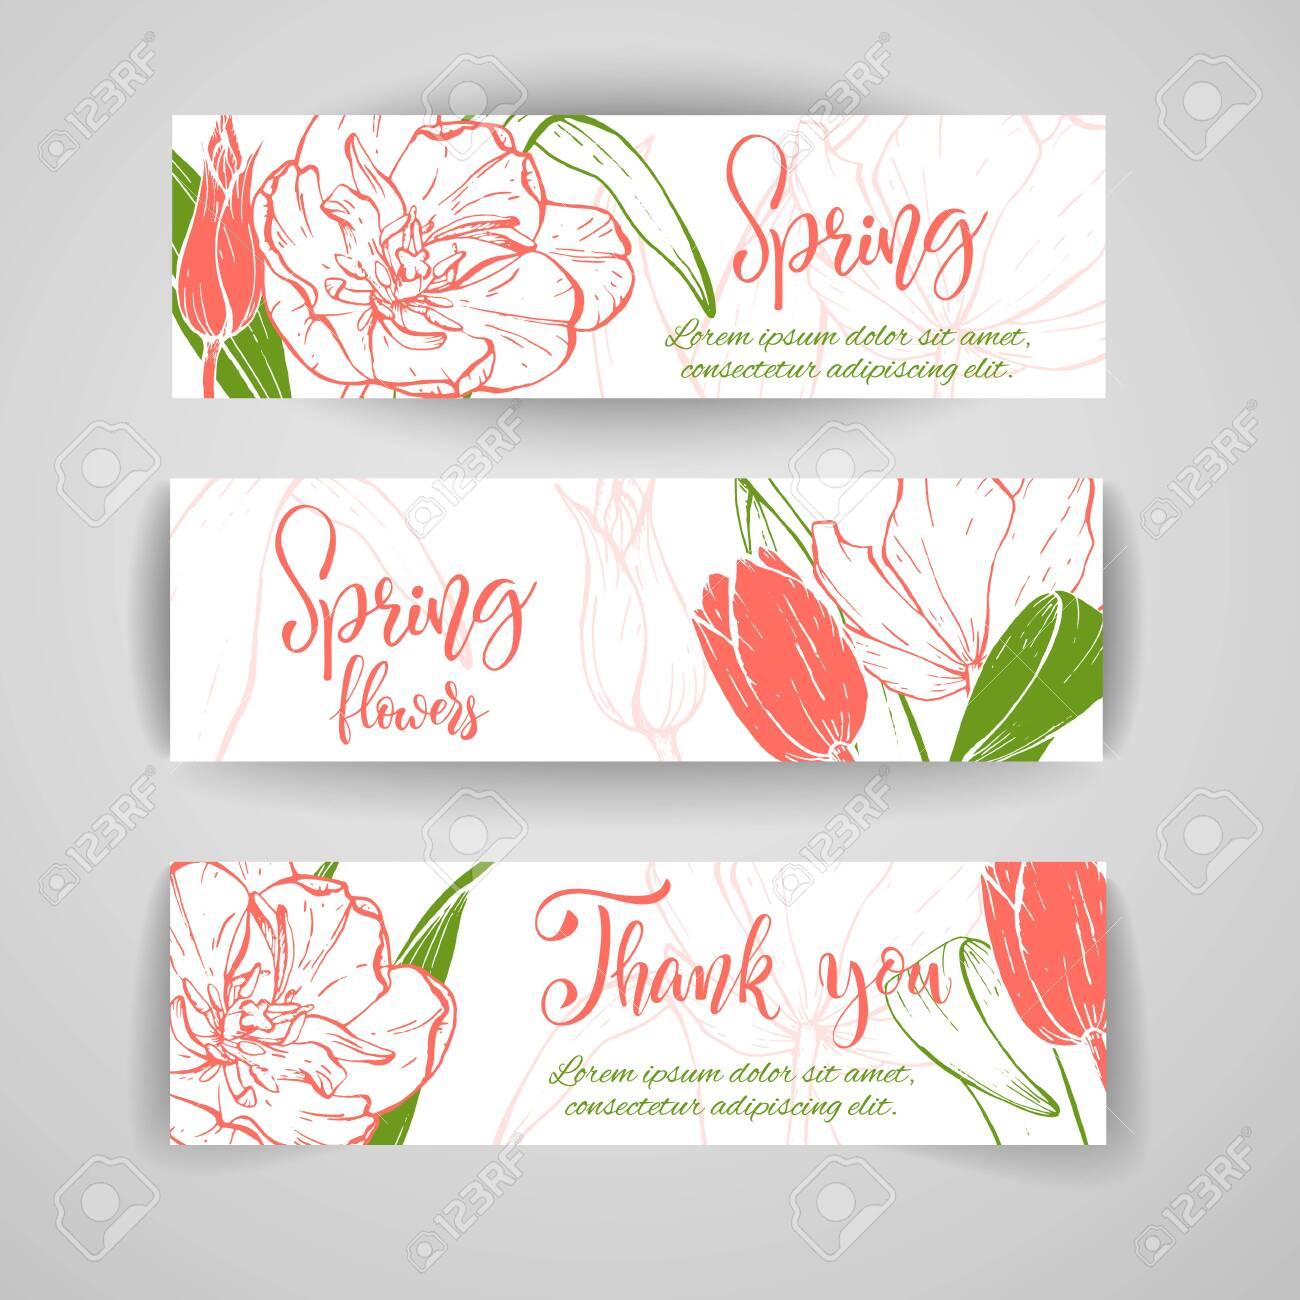 Sketch linear tulip blossom. - 128391036